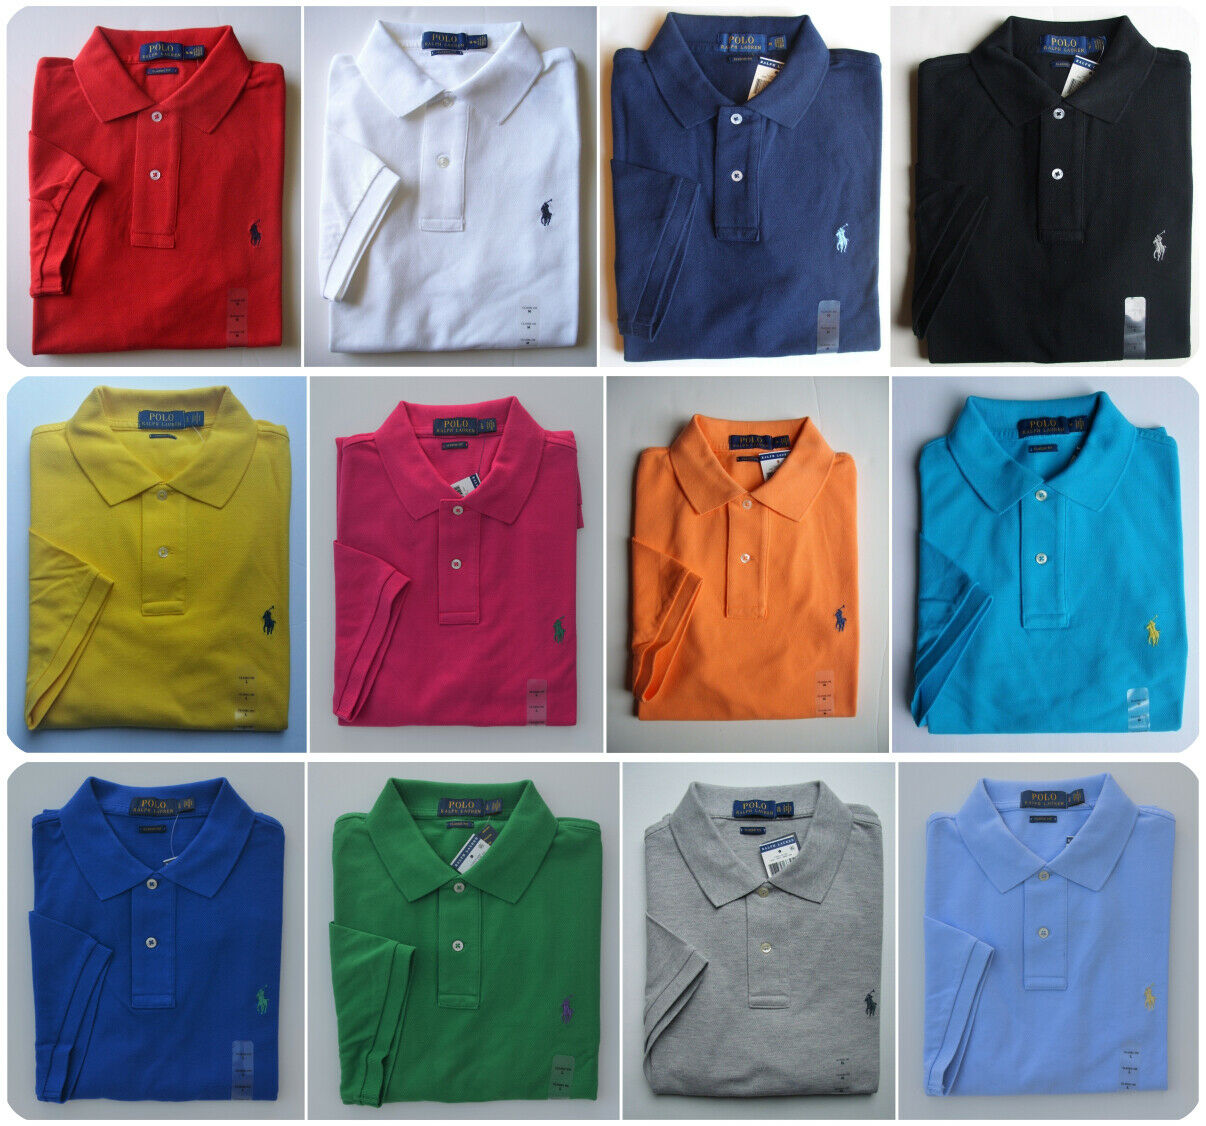 NWT Polo Ralph Lauren Men/'s Yellow//Blue Oxford Sport Shirt STANDARD FIT S M L